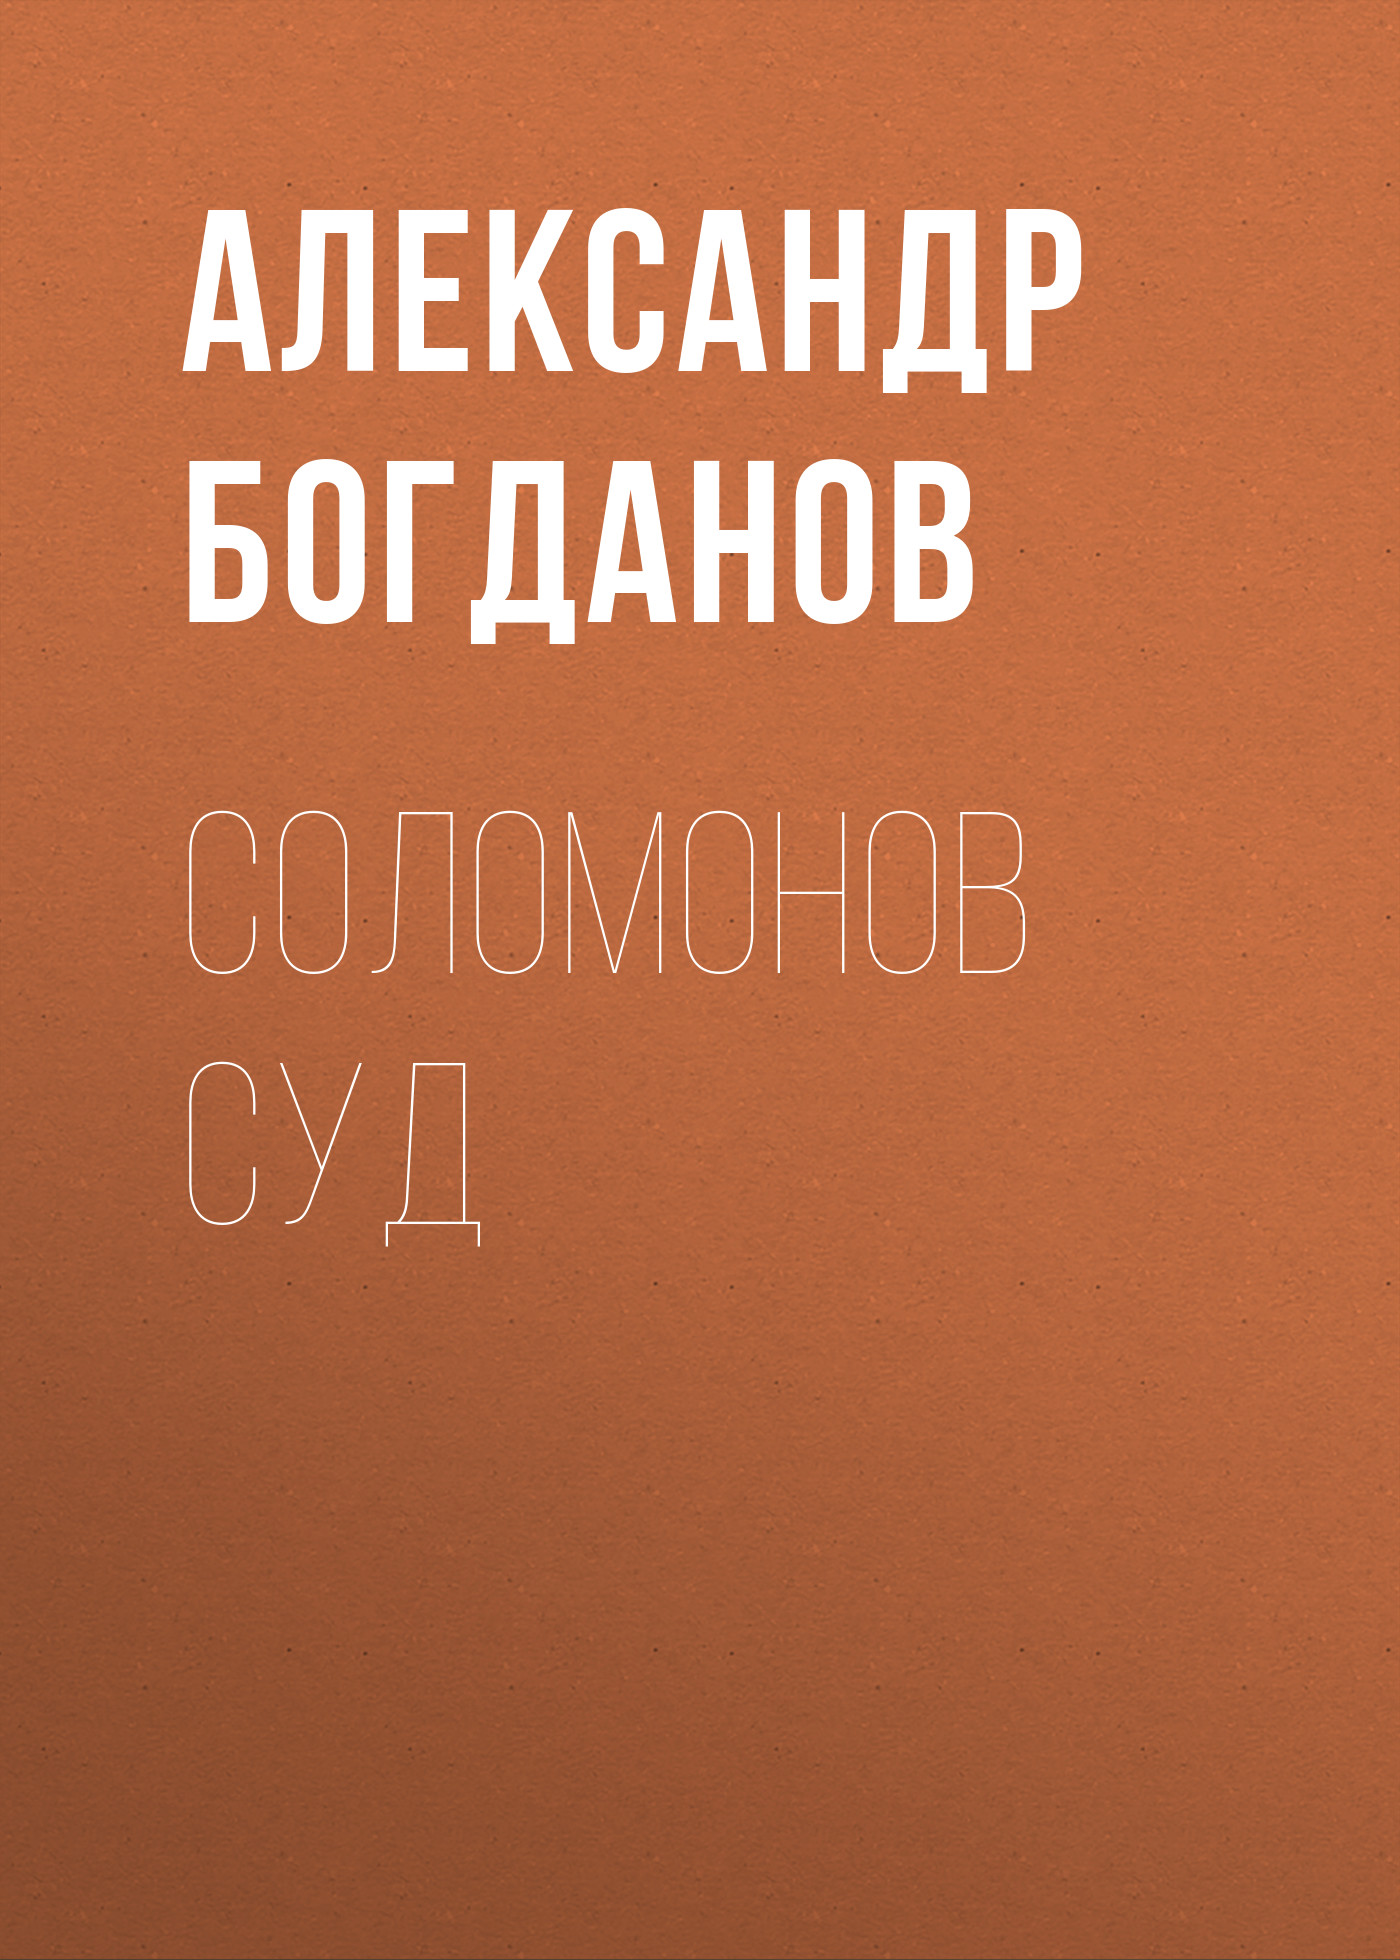 Александр Алексеевич Богданов Соломонов суд